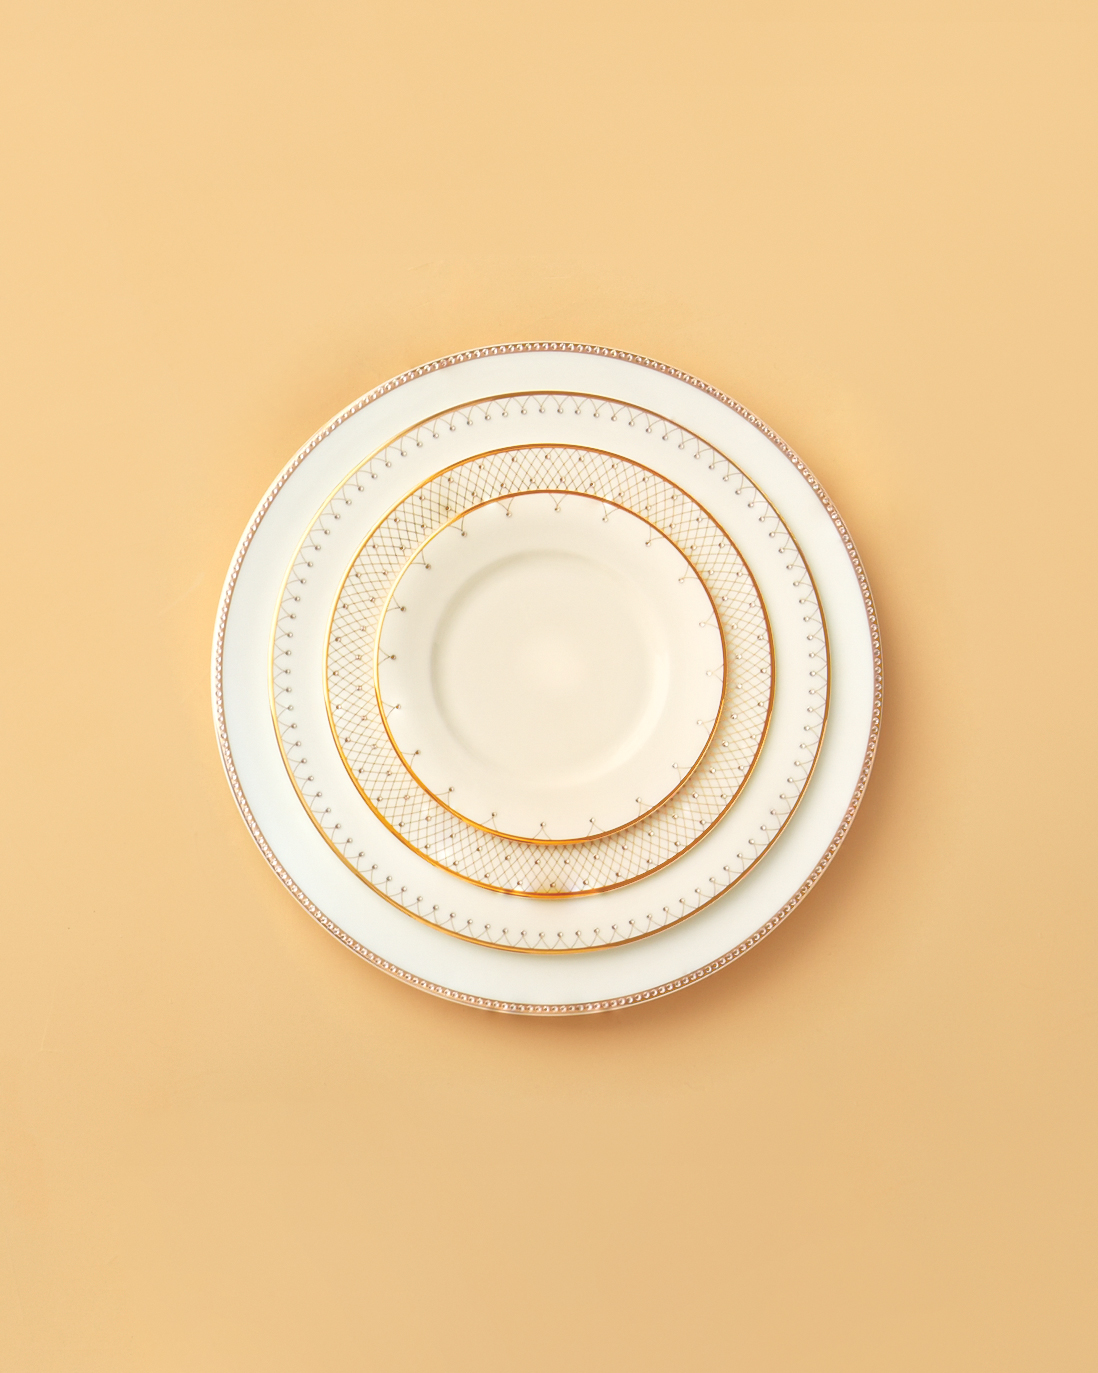 ines-de-santo-plates-mwd108878.jpg